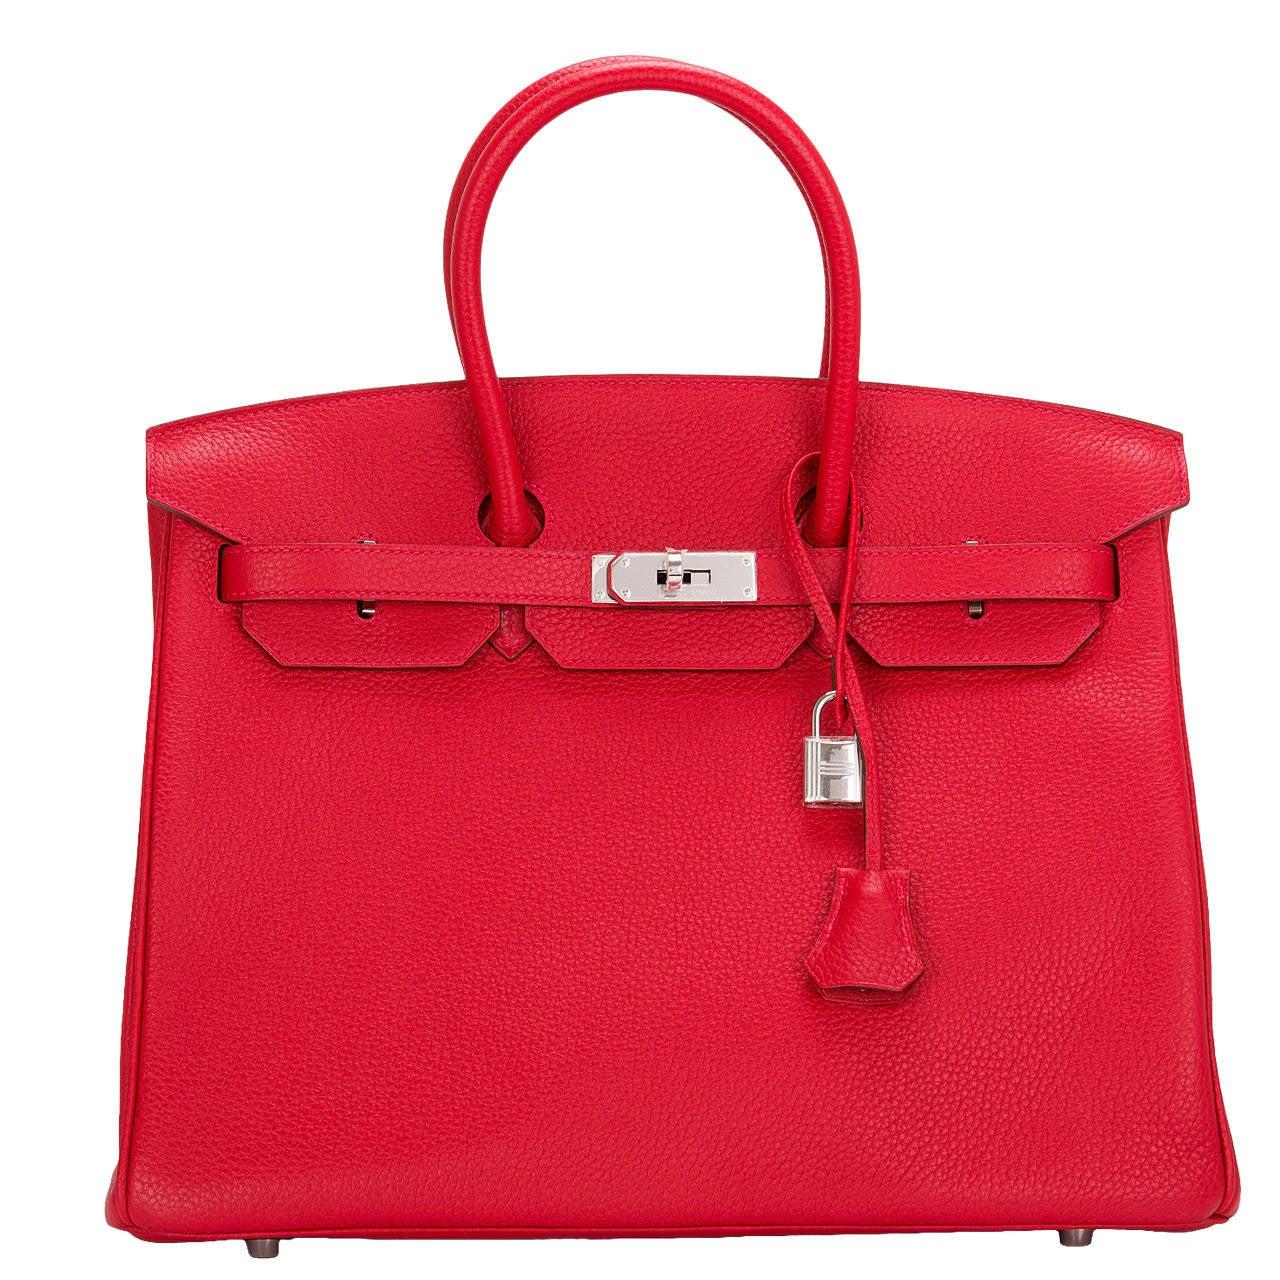 Hermes Rouge Casaque Clemence Birkin 35cm Palladium Hardware For Sale